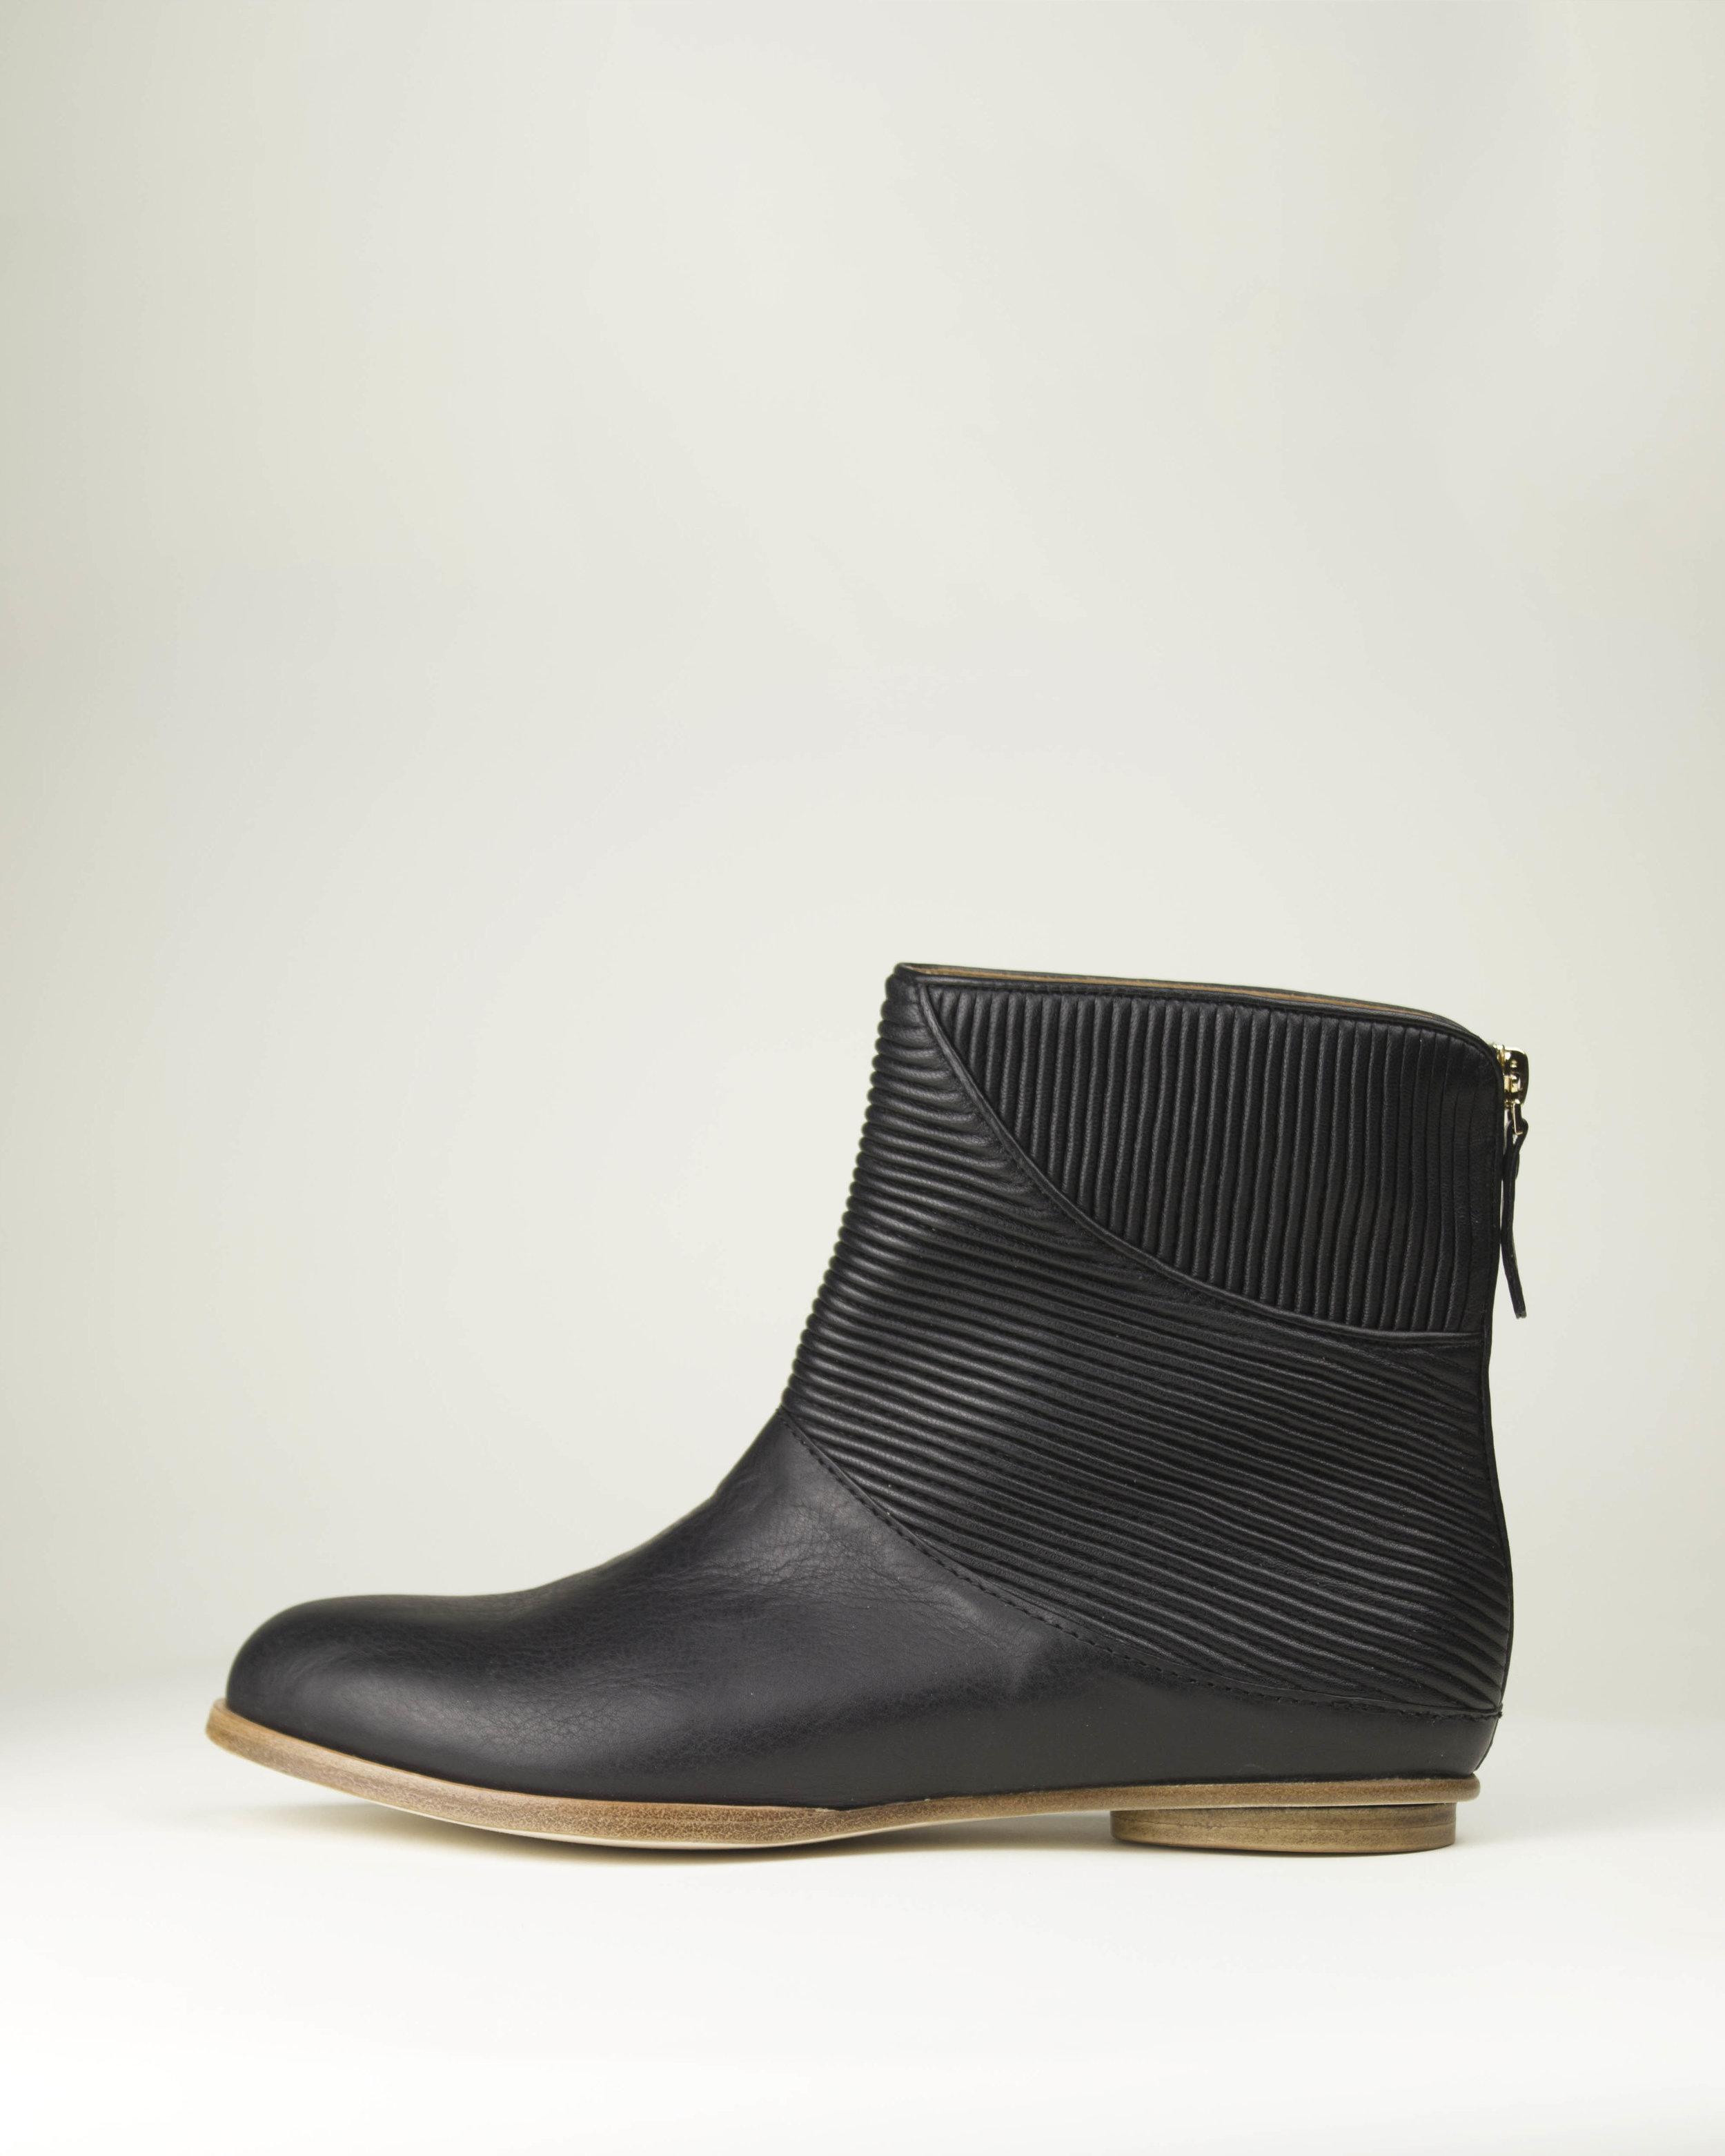 corie humble shoe design collection seoul korea portfolio boot